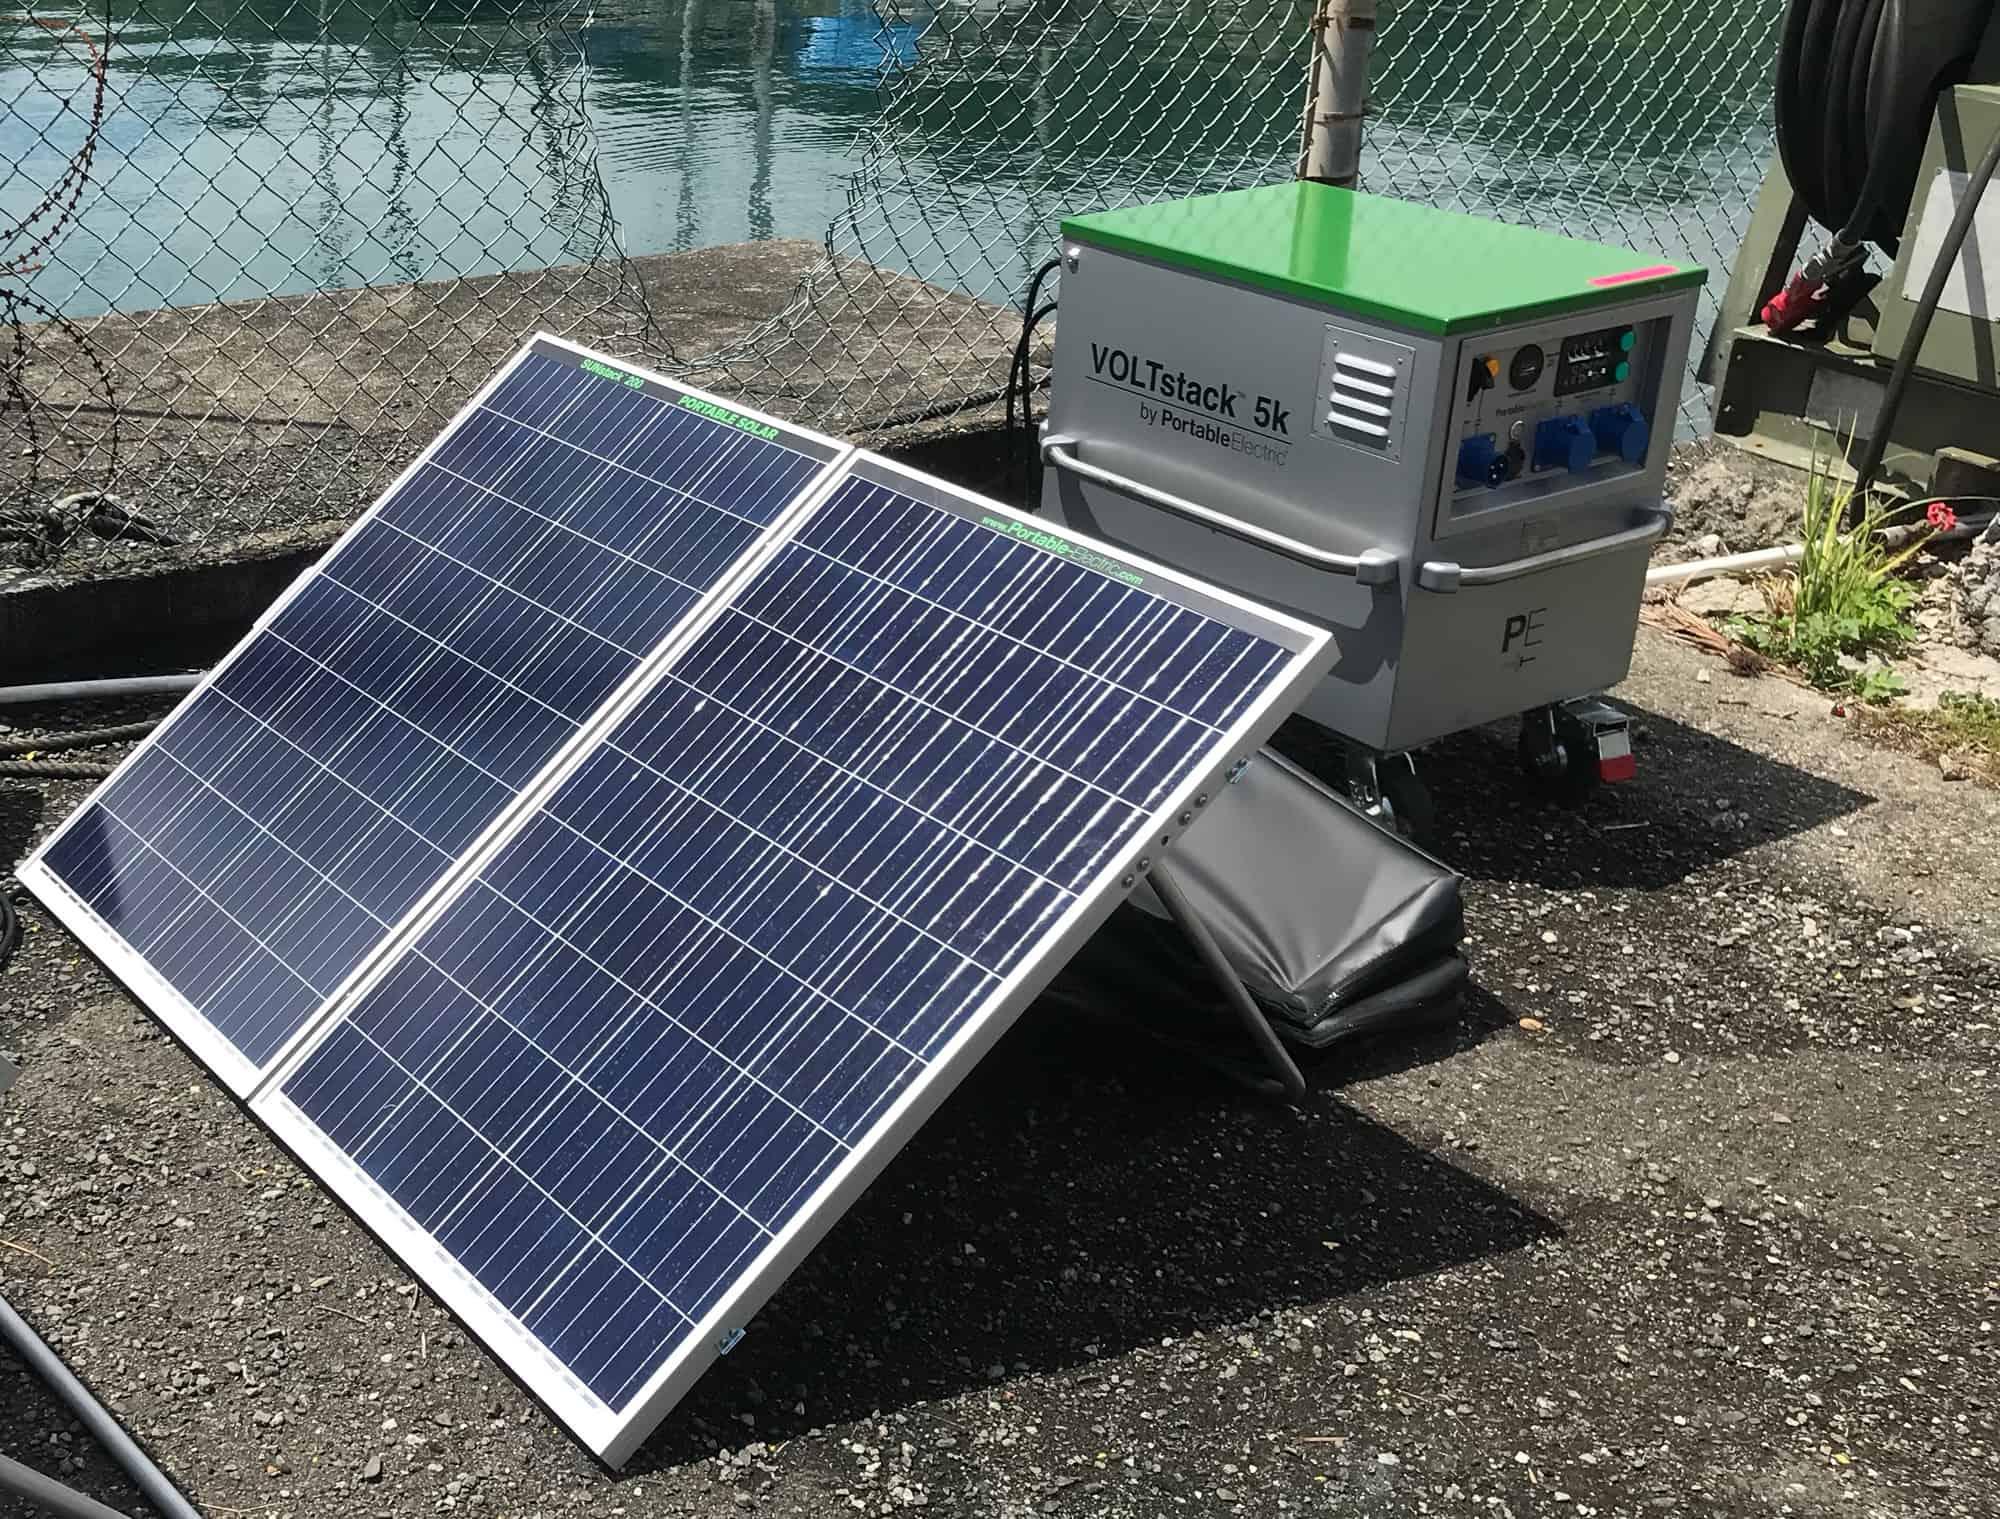 The VOLTstack uses clean, renewable power